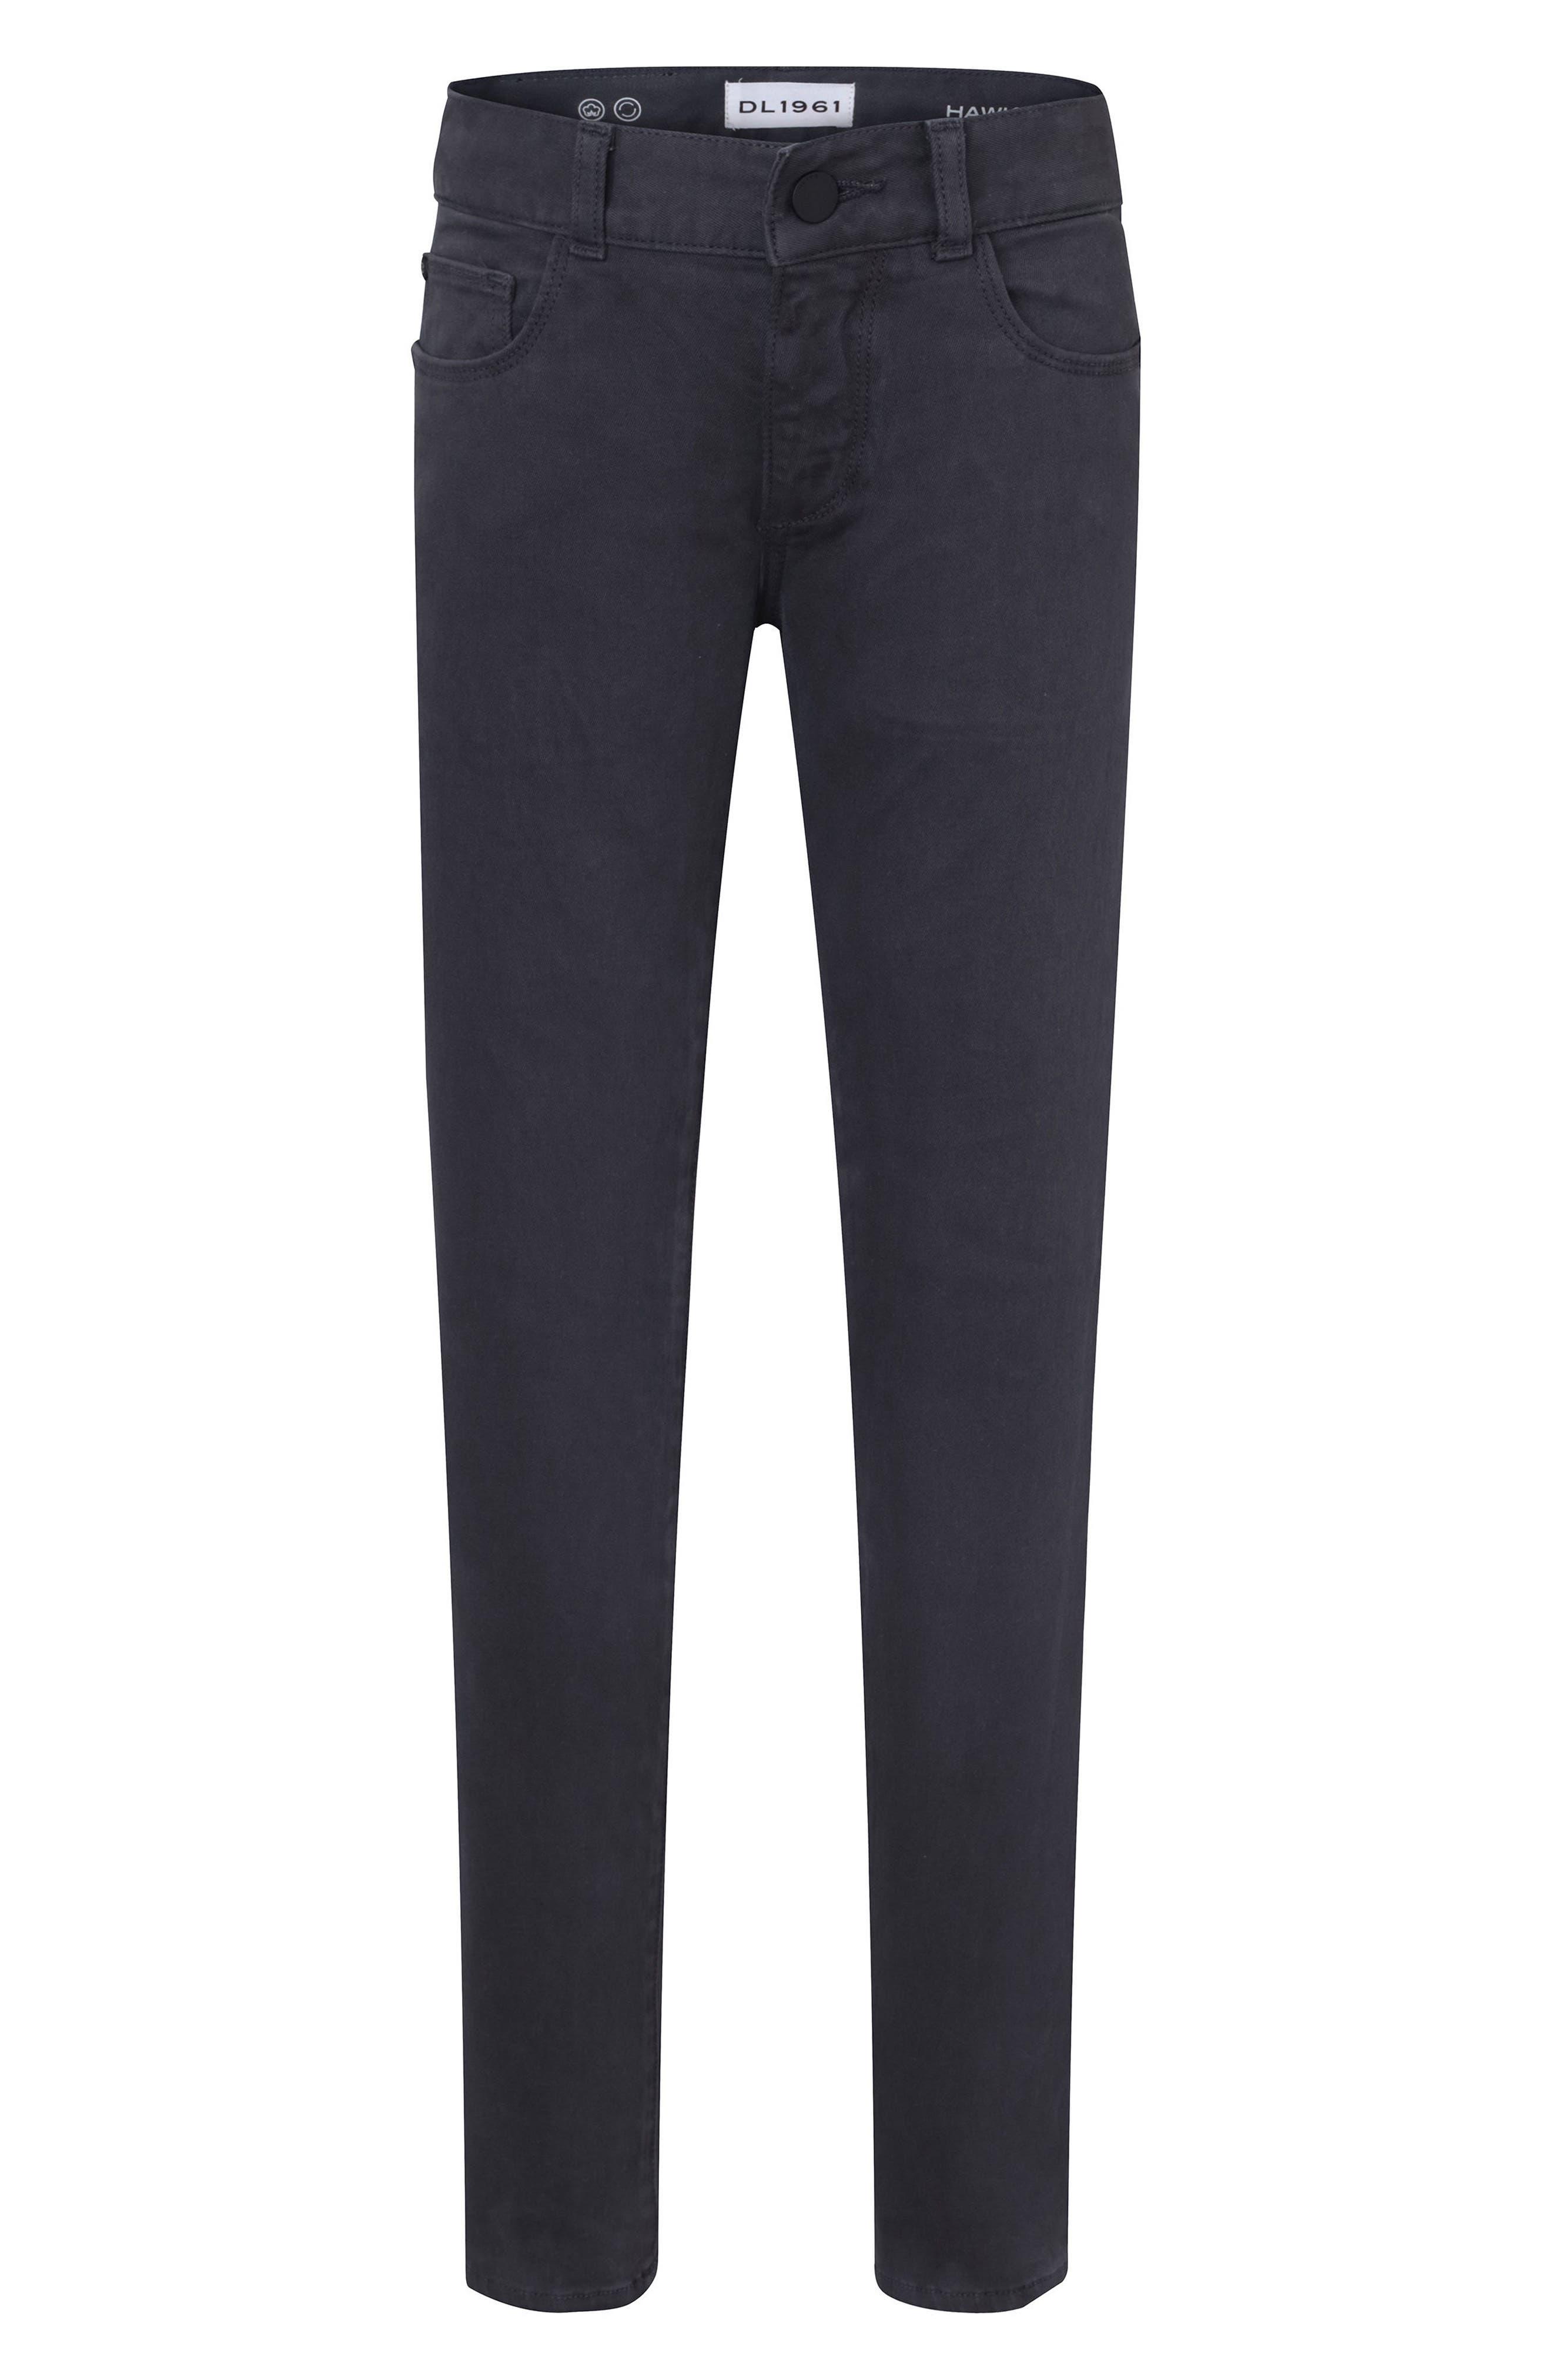 Hawke Skinny Jeans,                         Main,                         color, DAB